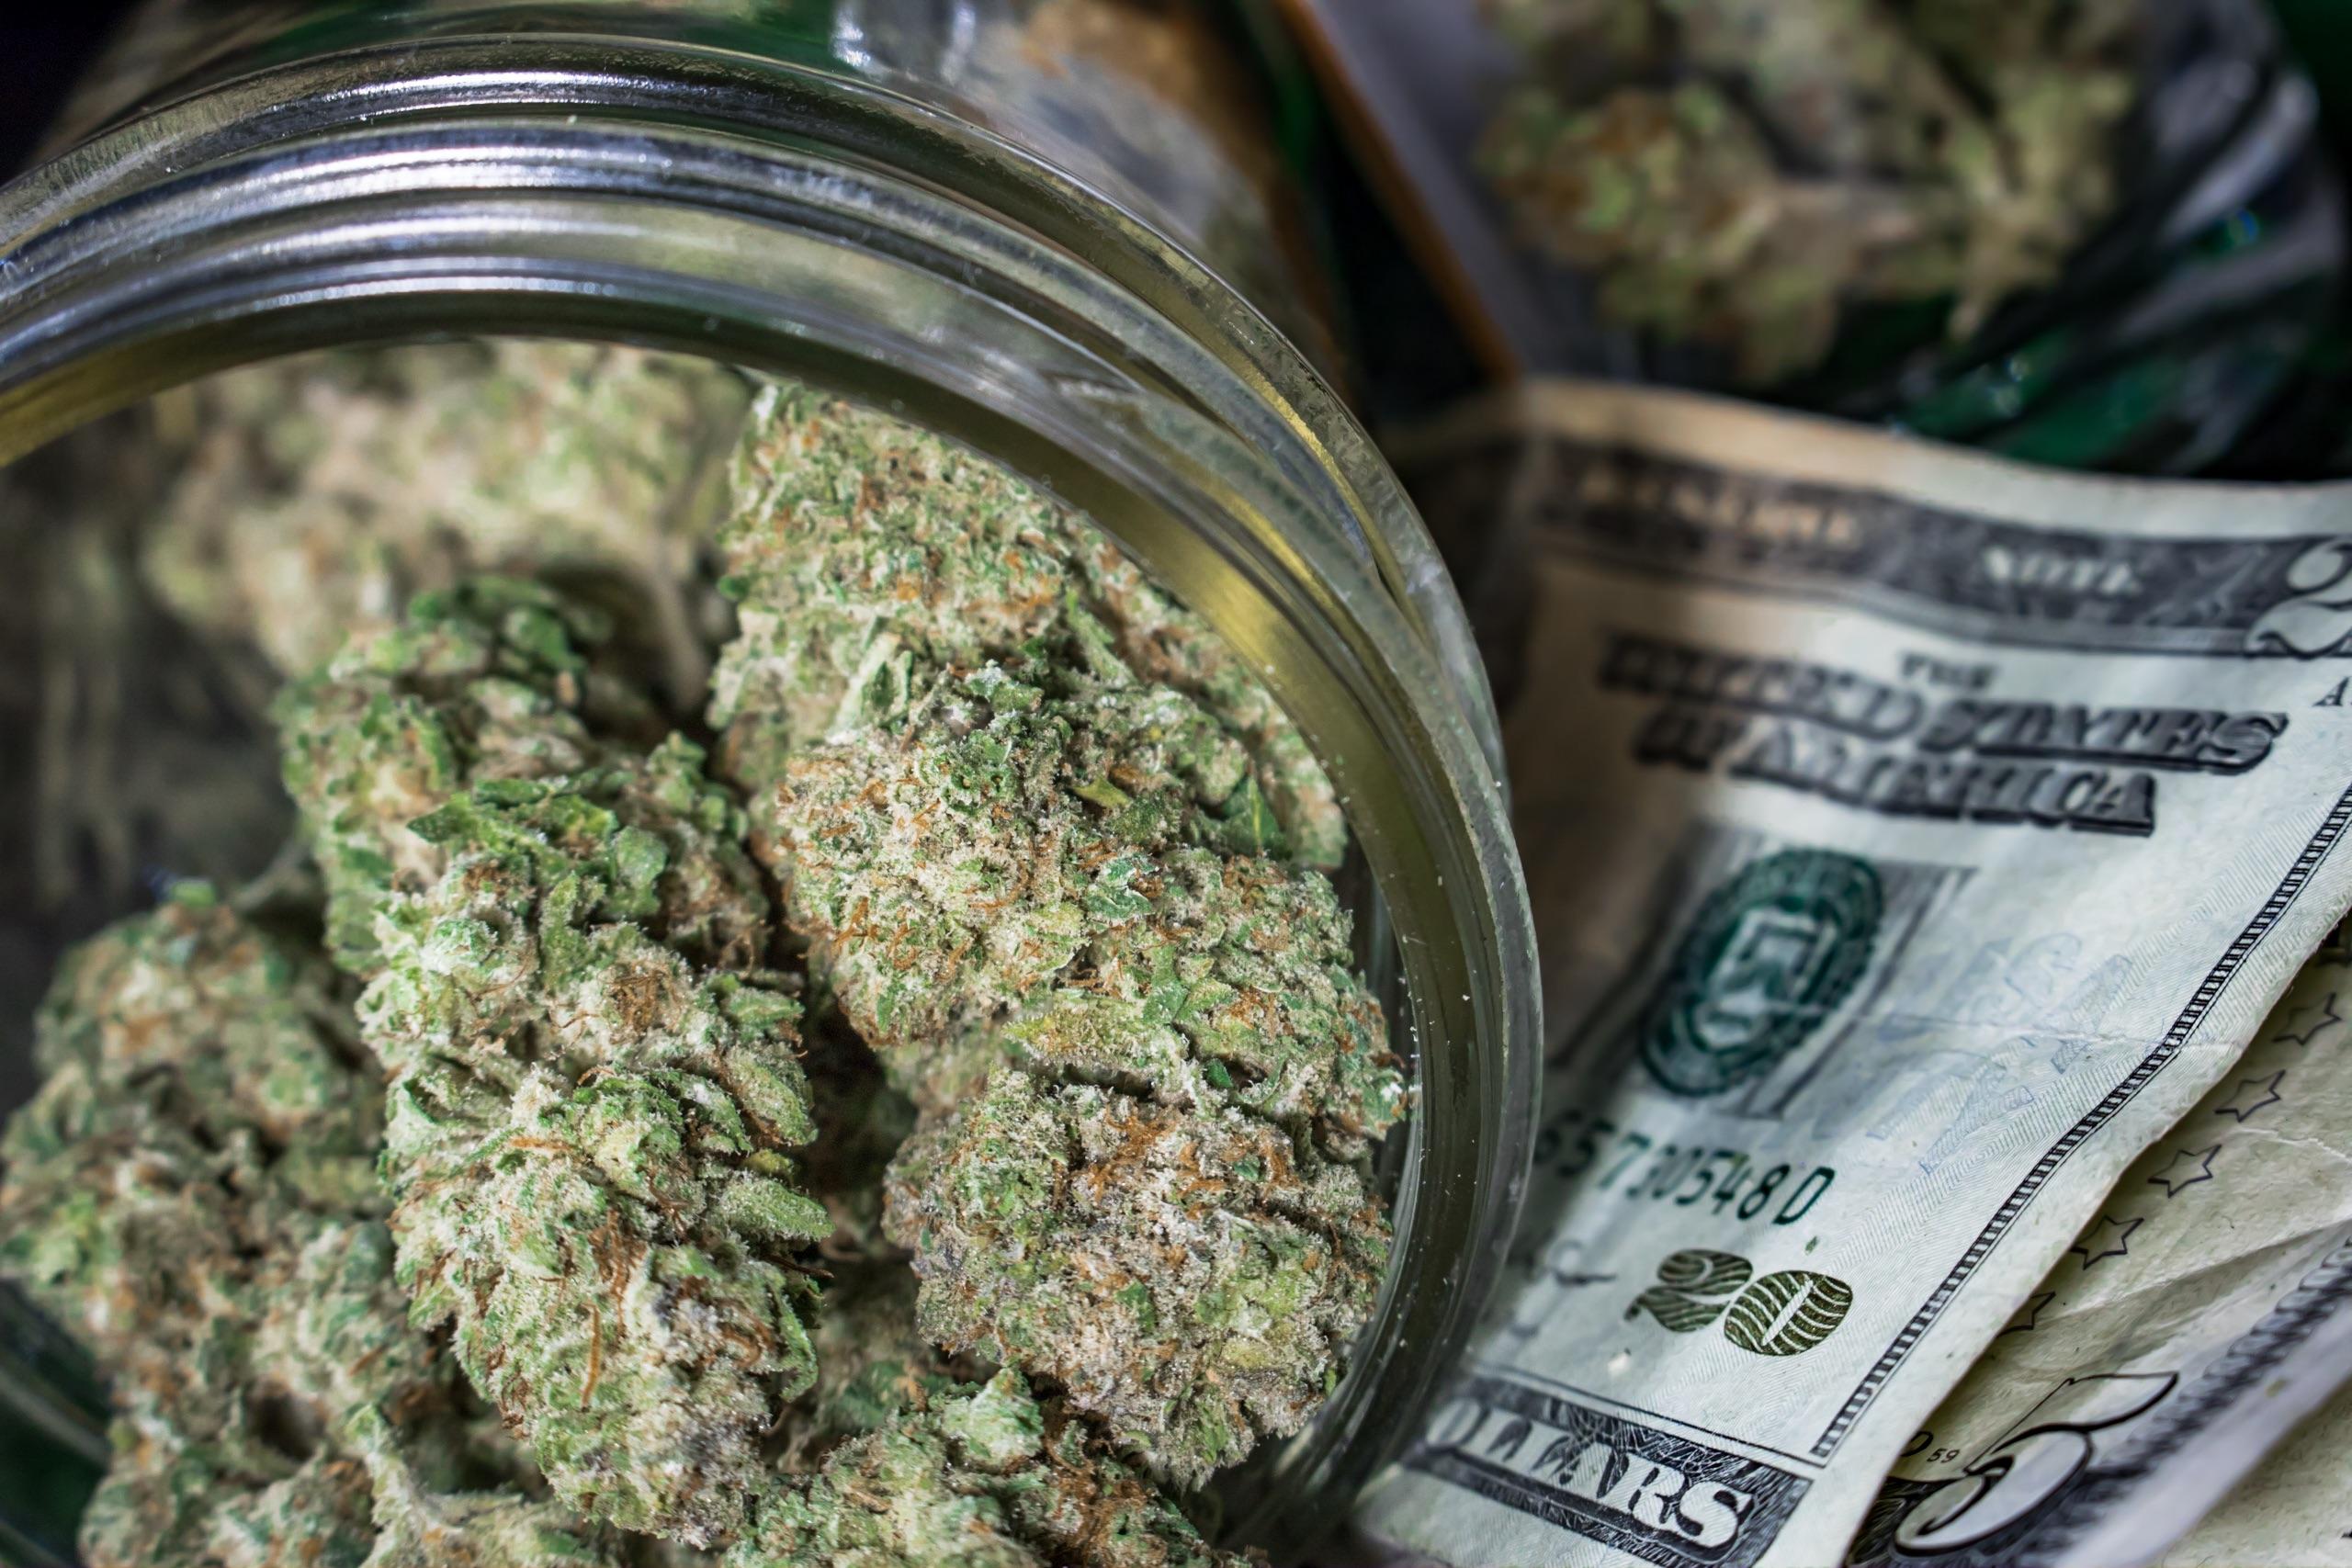 Cannabis in a mason jar and cash money.